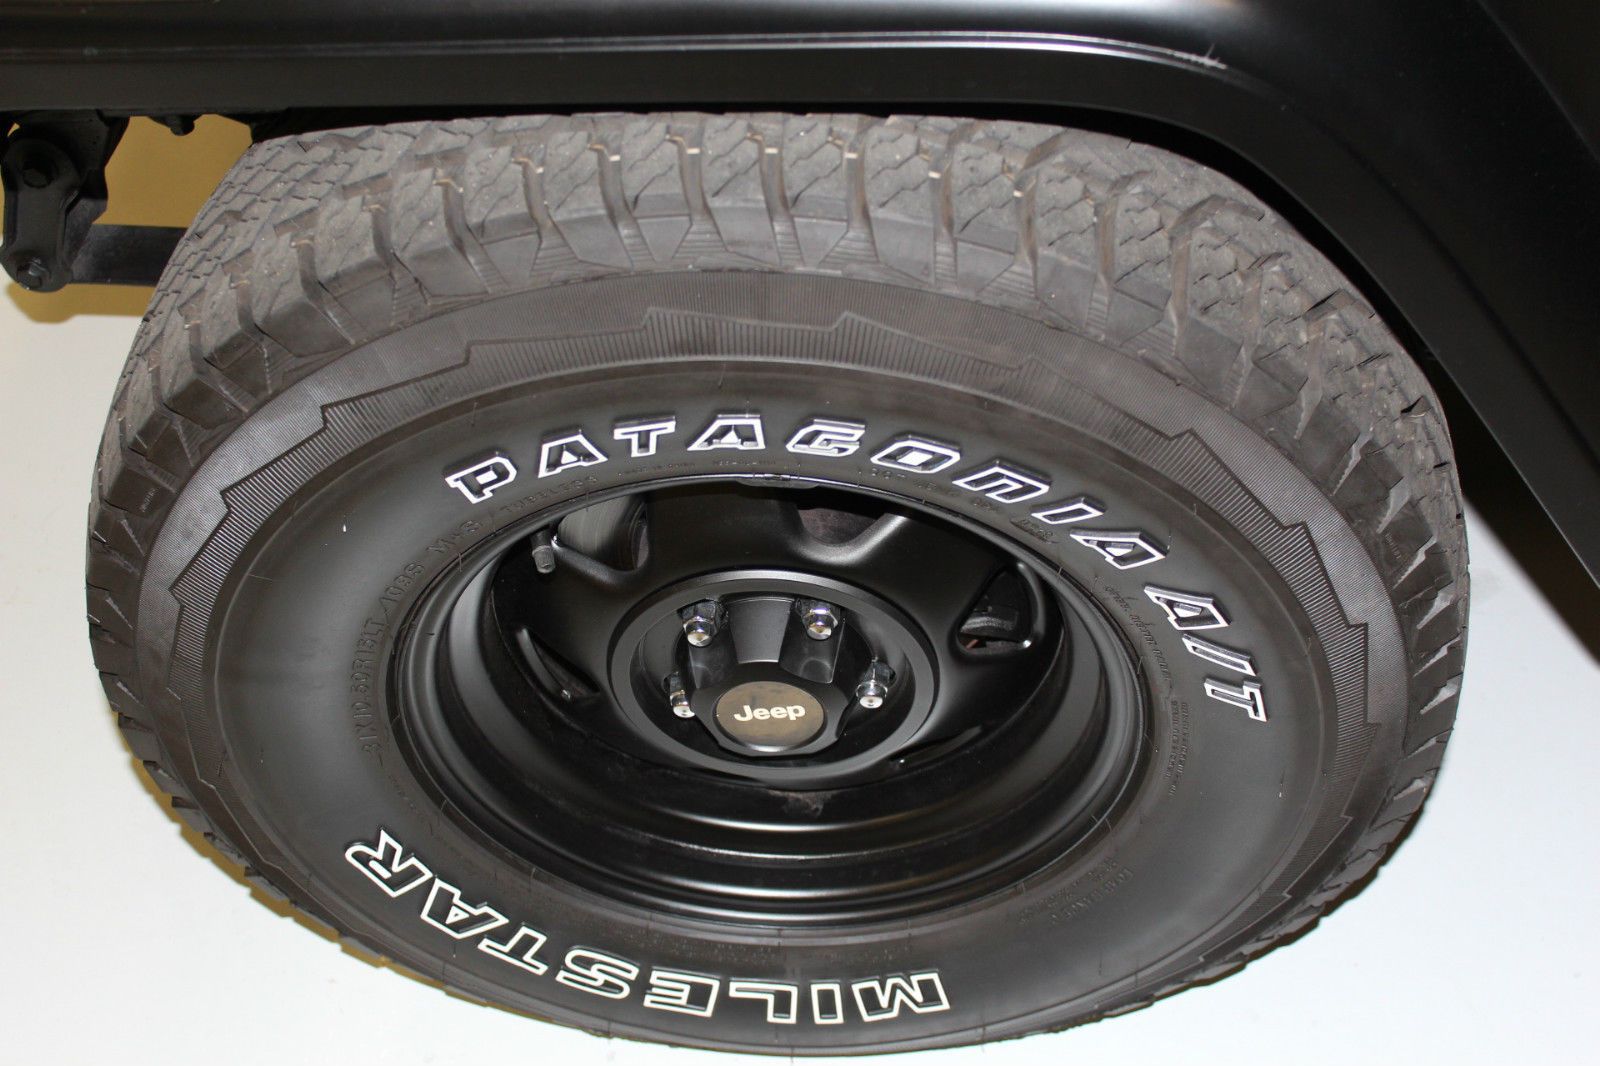 1990 Jeep Wrangler Base Sport Utility 2 Door 42l Black Hardtop New 1988 Hard Top Tires Belts